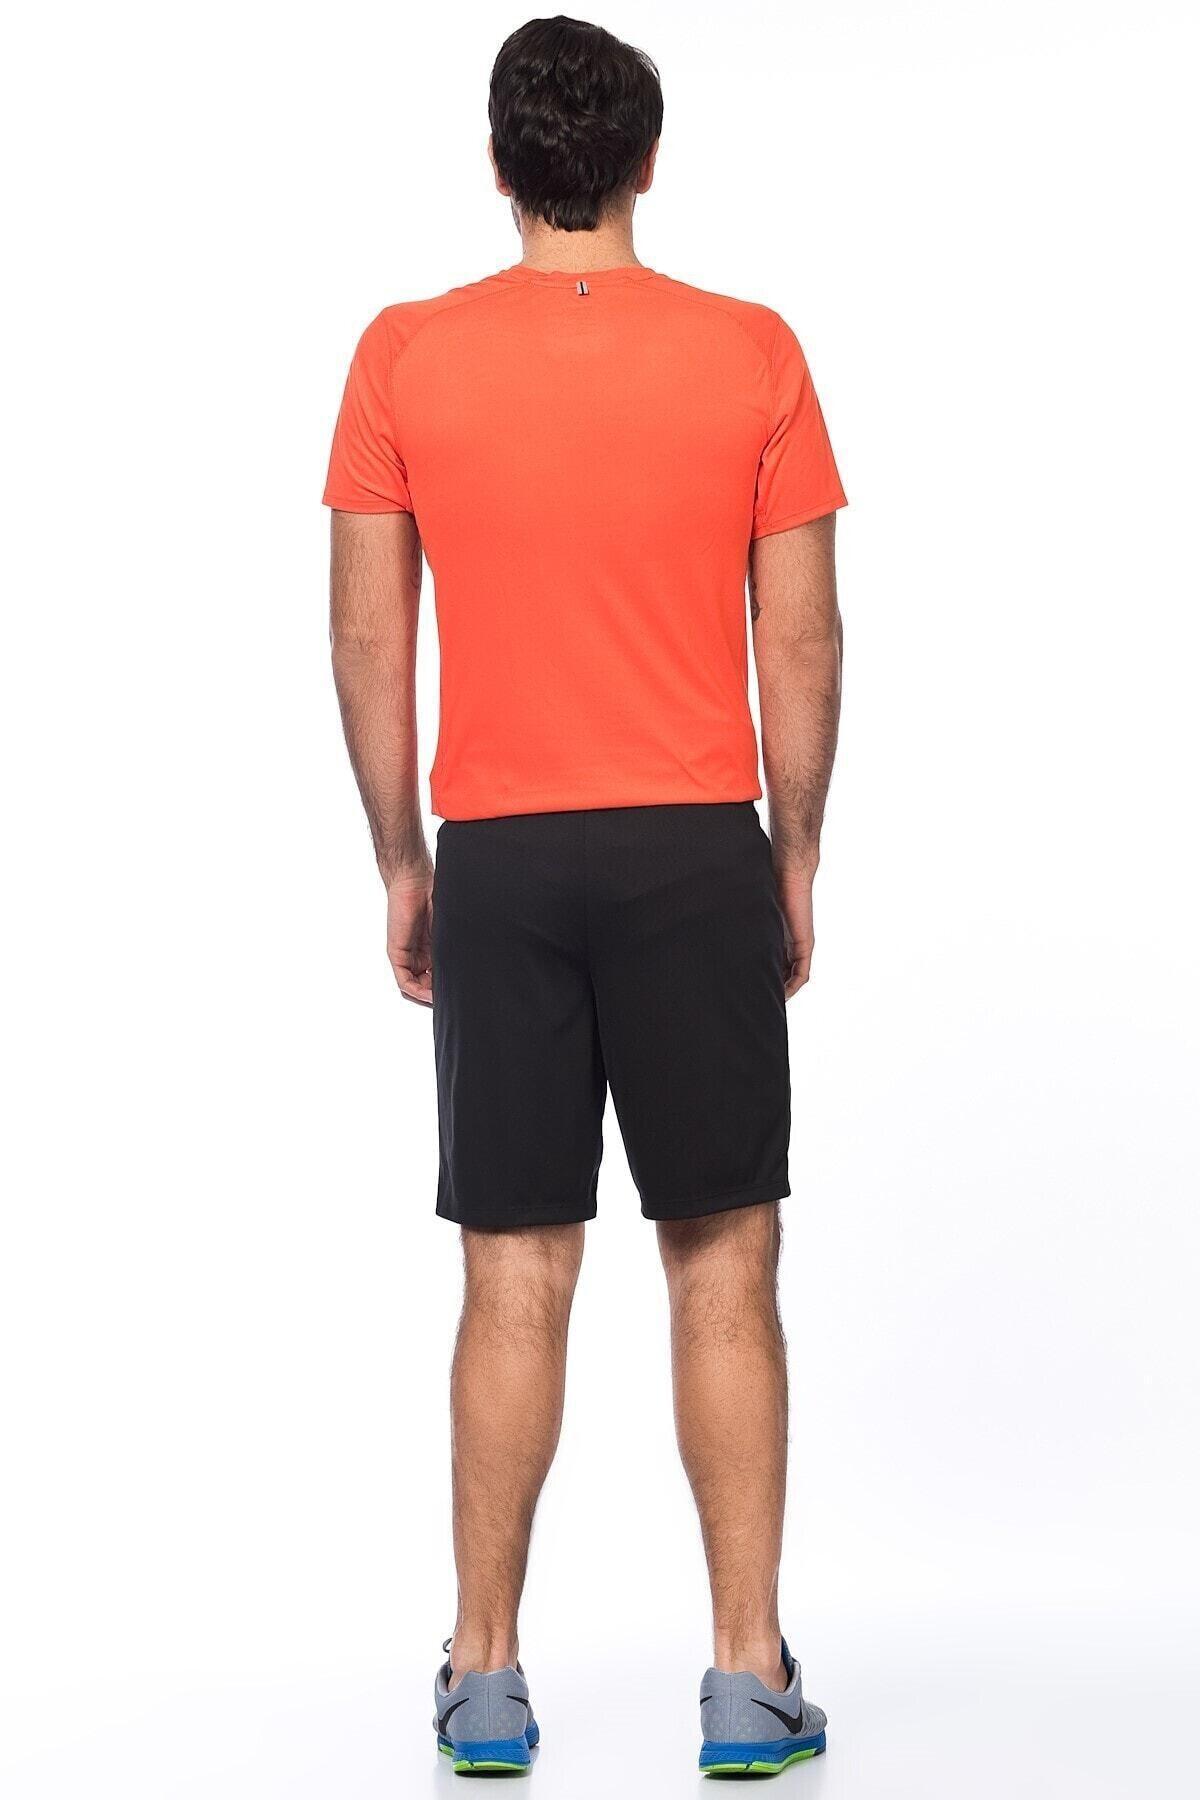 Nike Nıke - Park Iı Knit Short 2